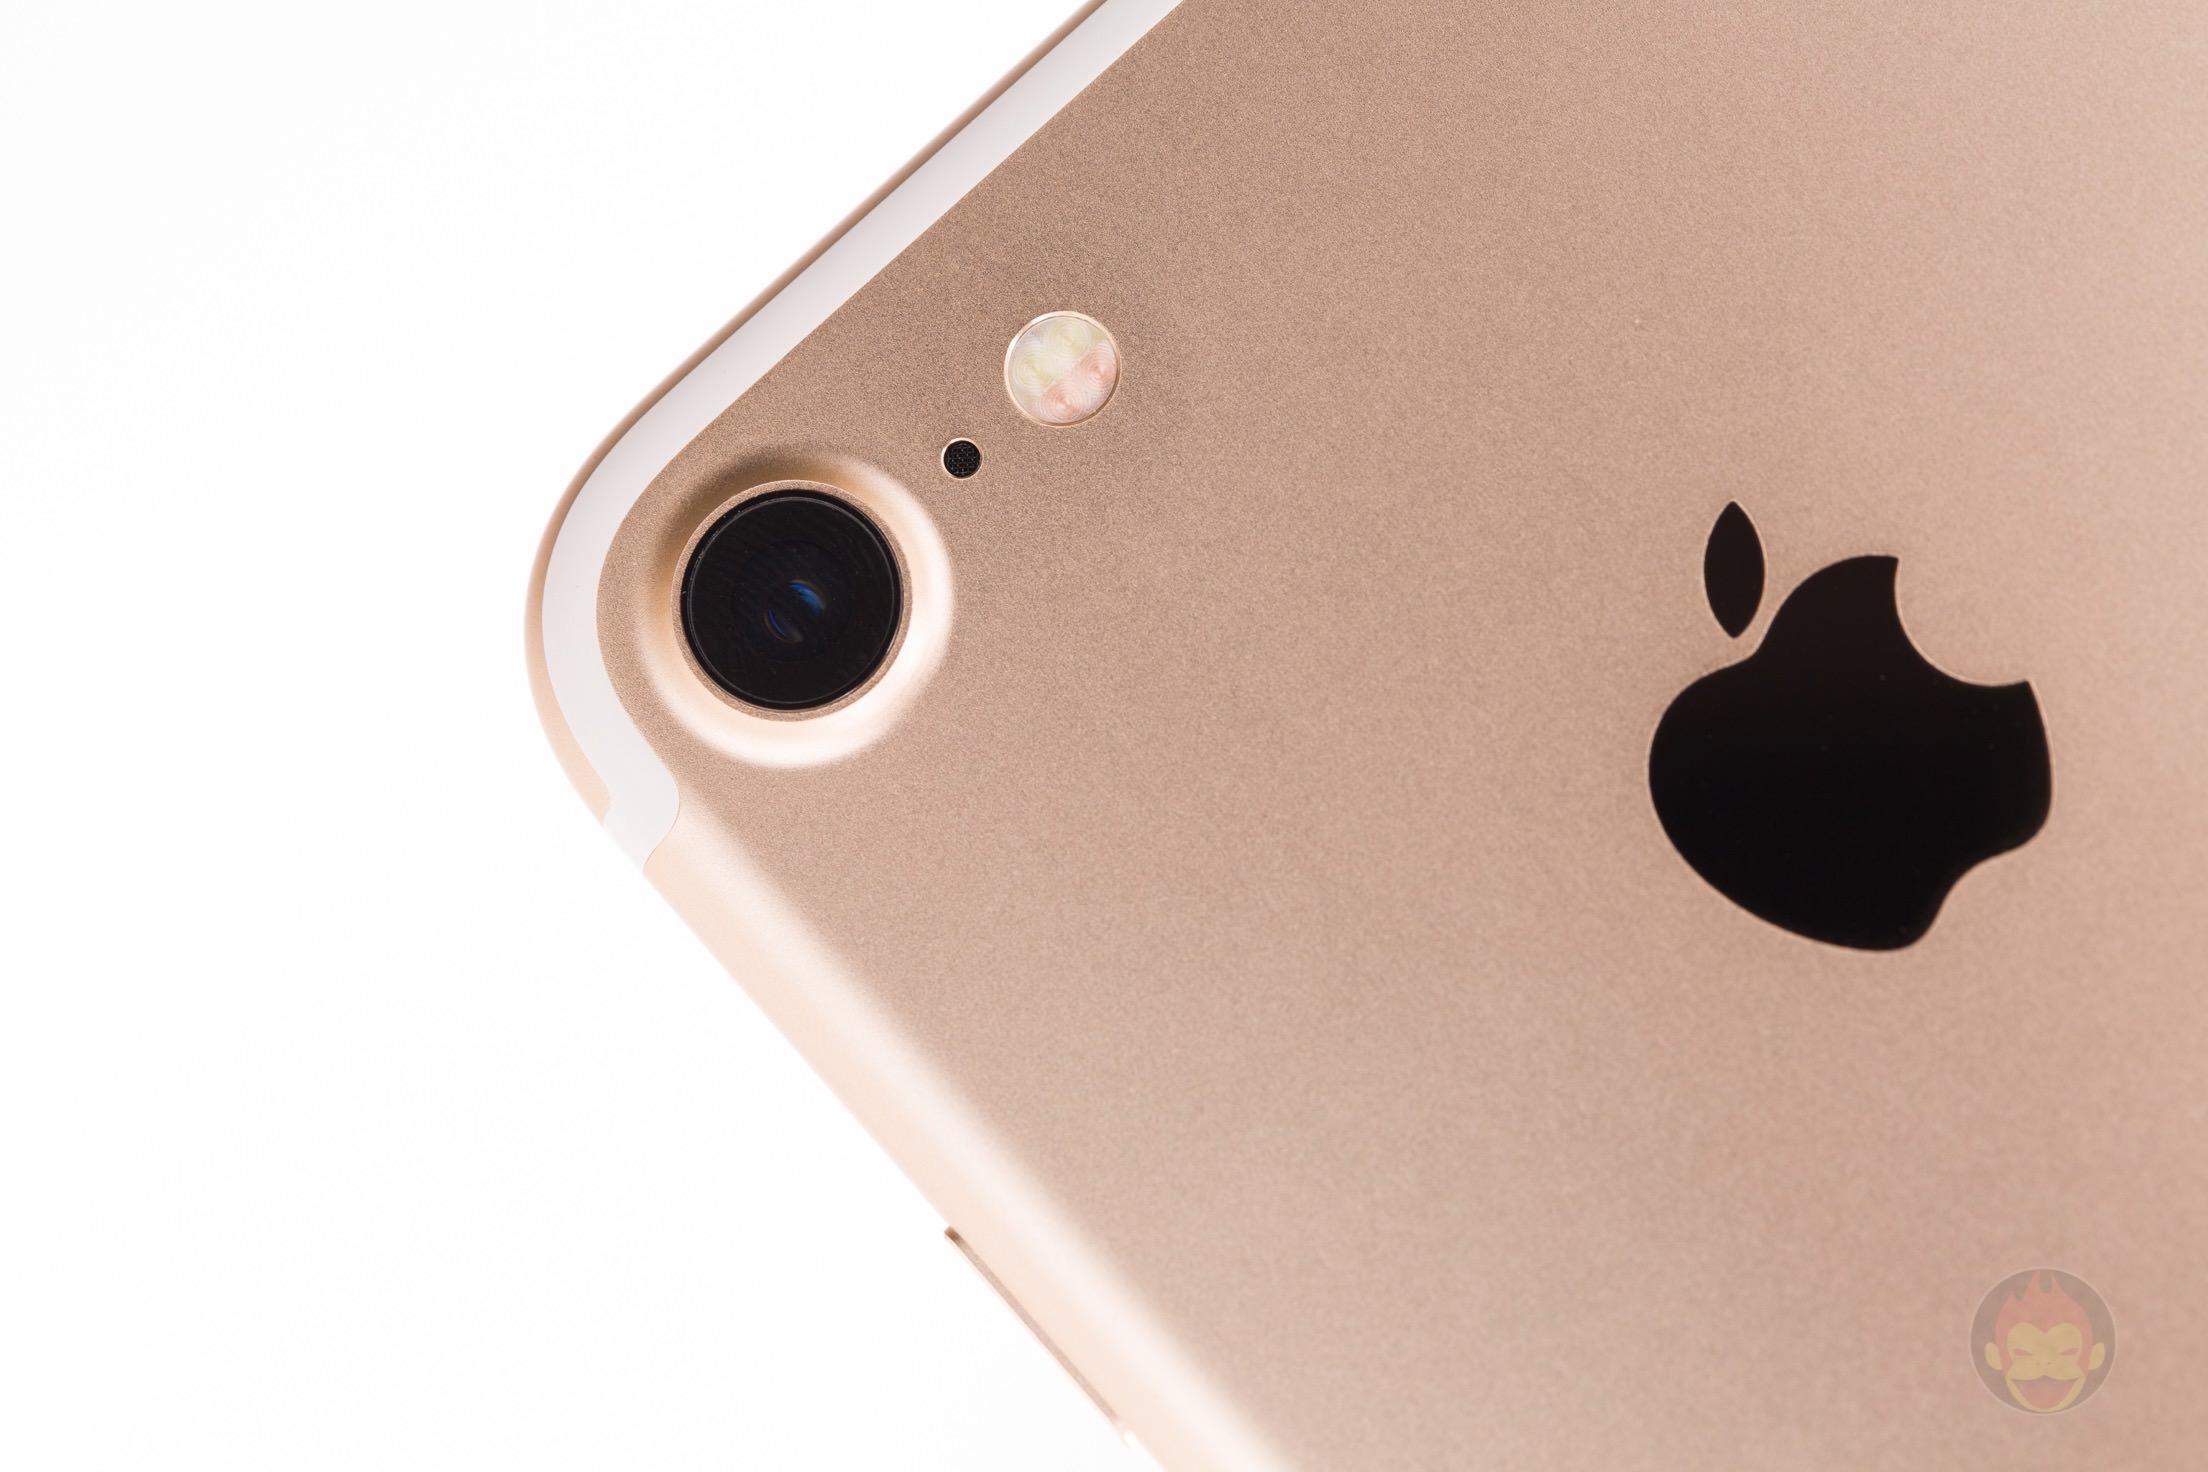 IPhone 7 Gold Model